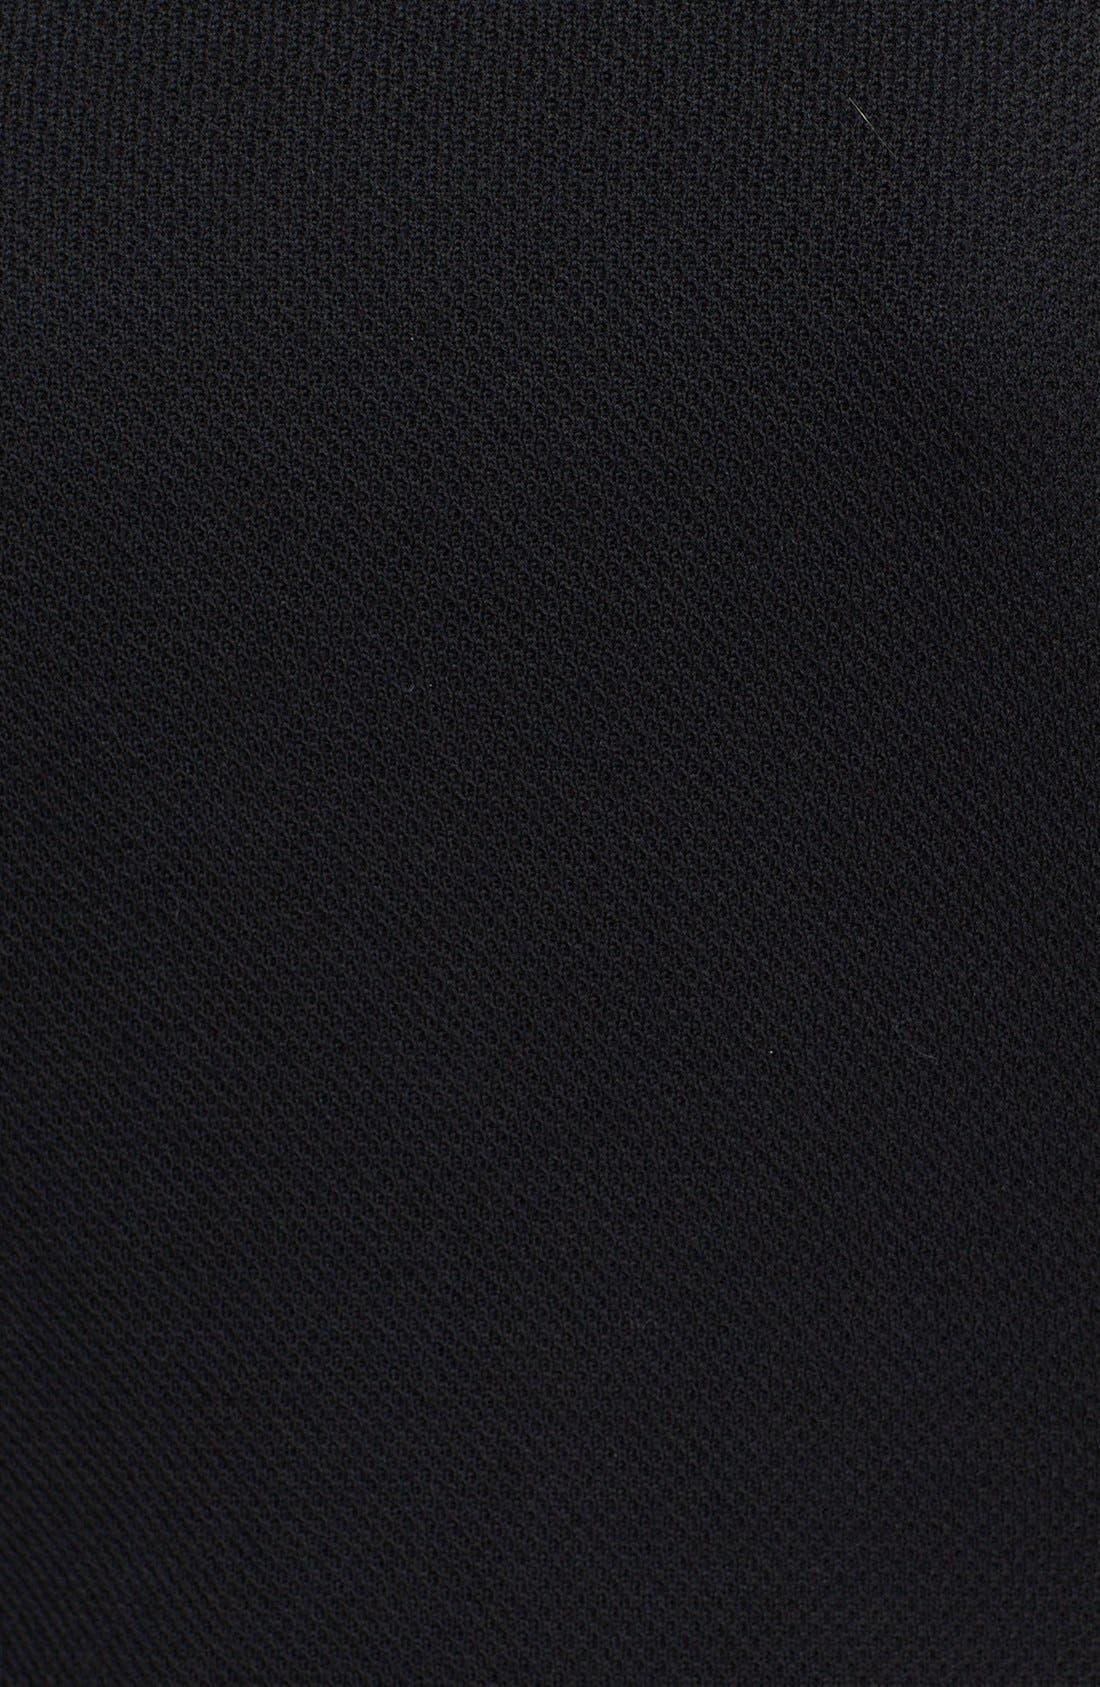 Milano Piqué Knit Pencil Skirt,                             Alternate thumbnail 5, color,                             001